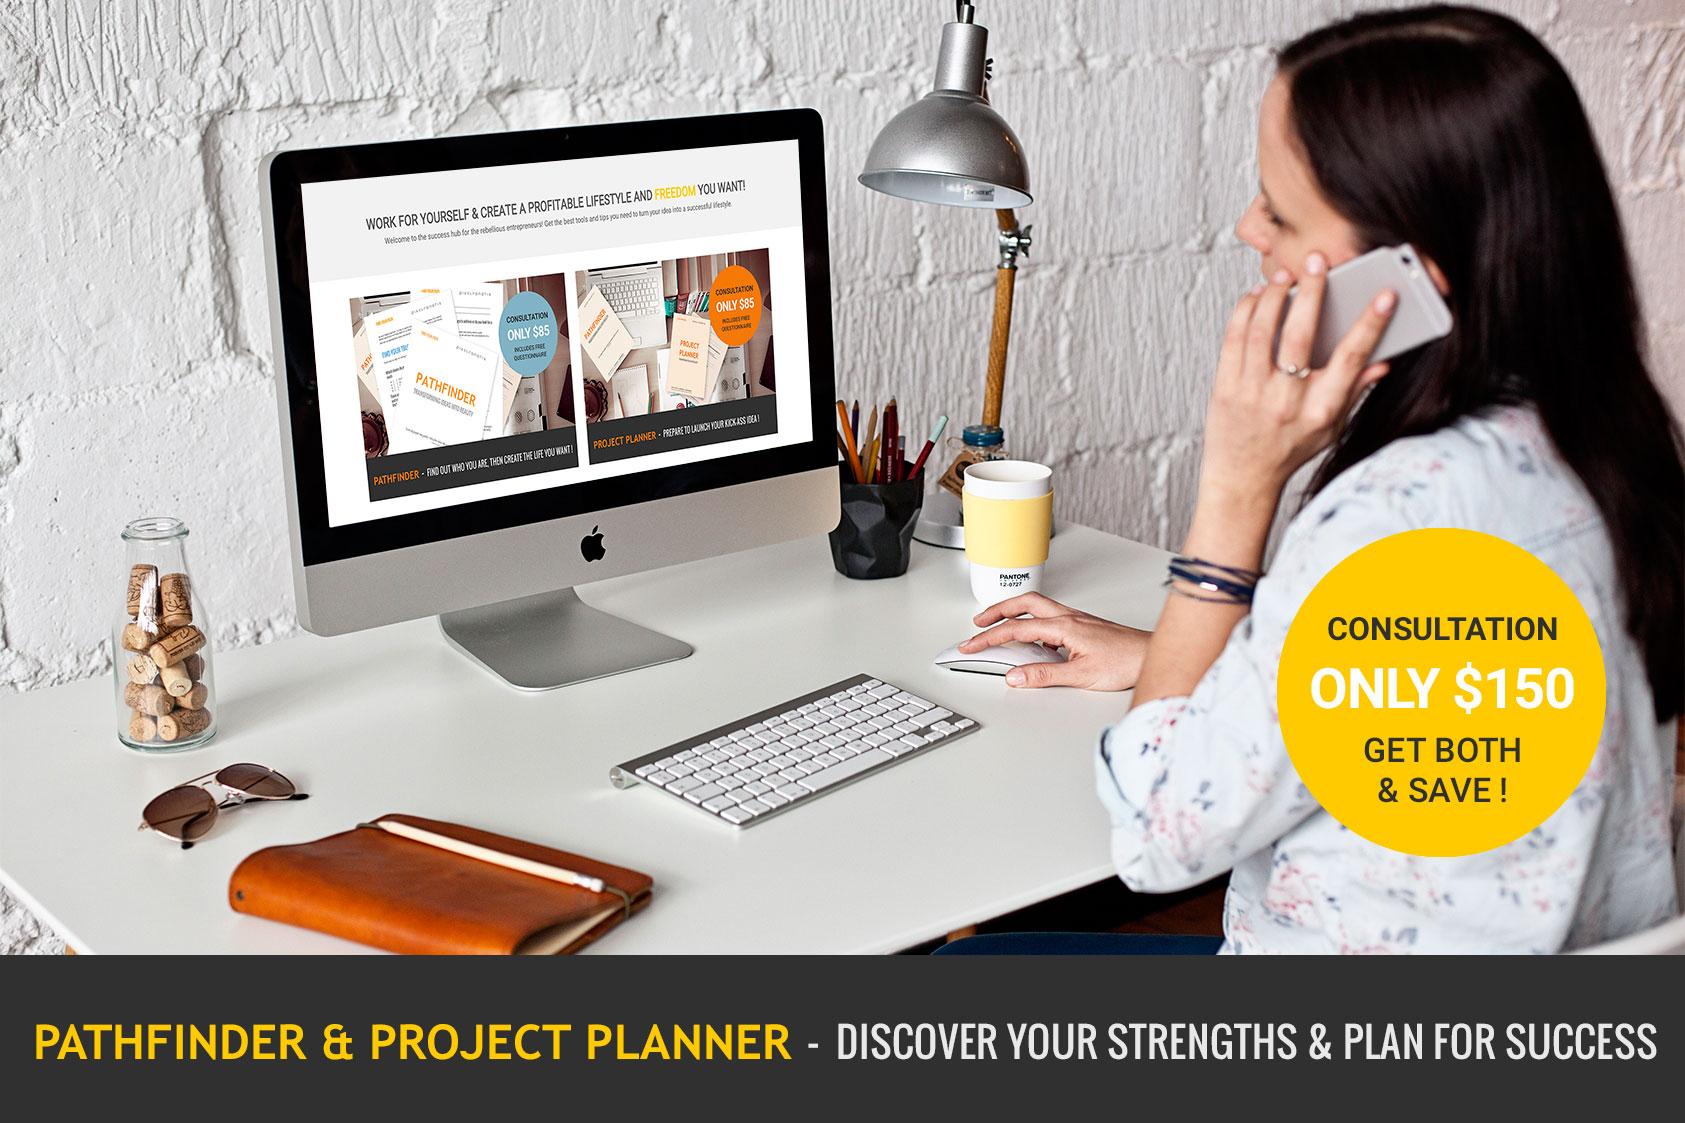 Pathfinder Amp Project Planner